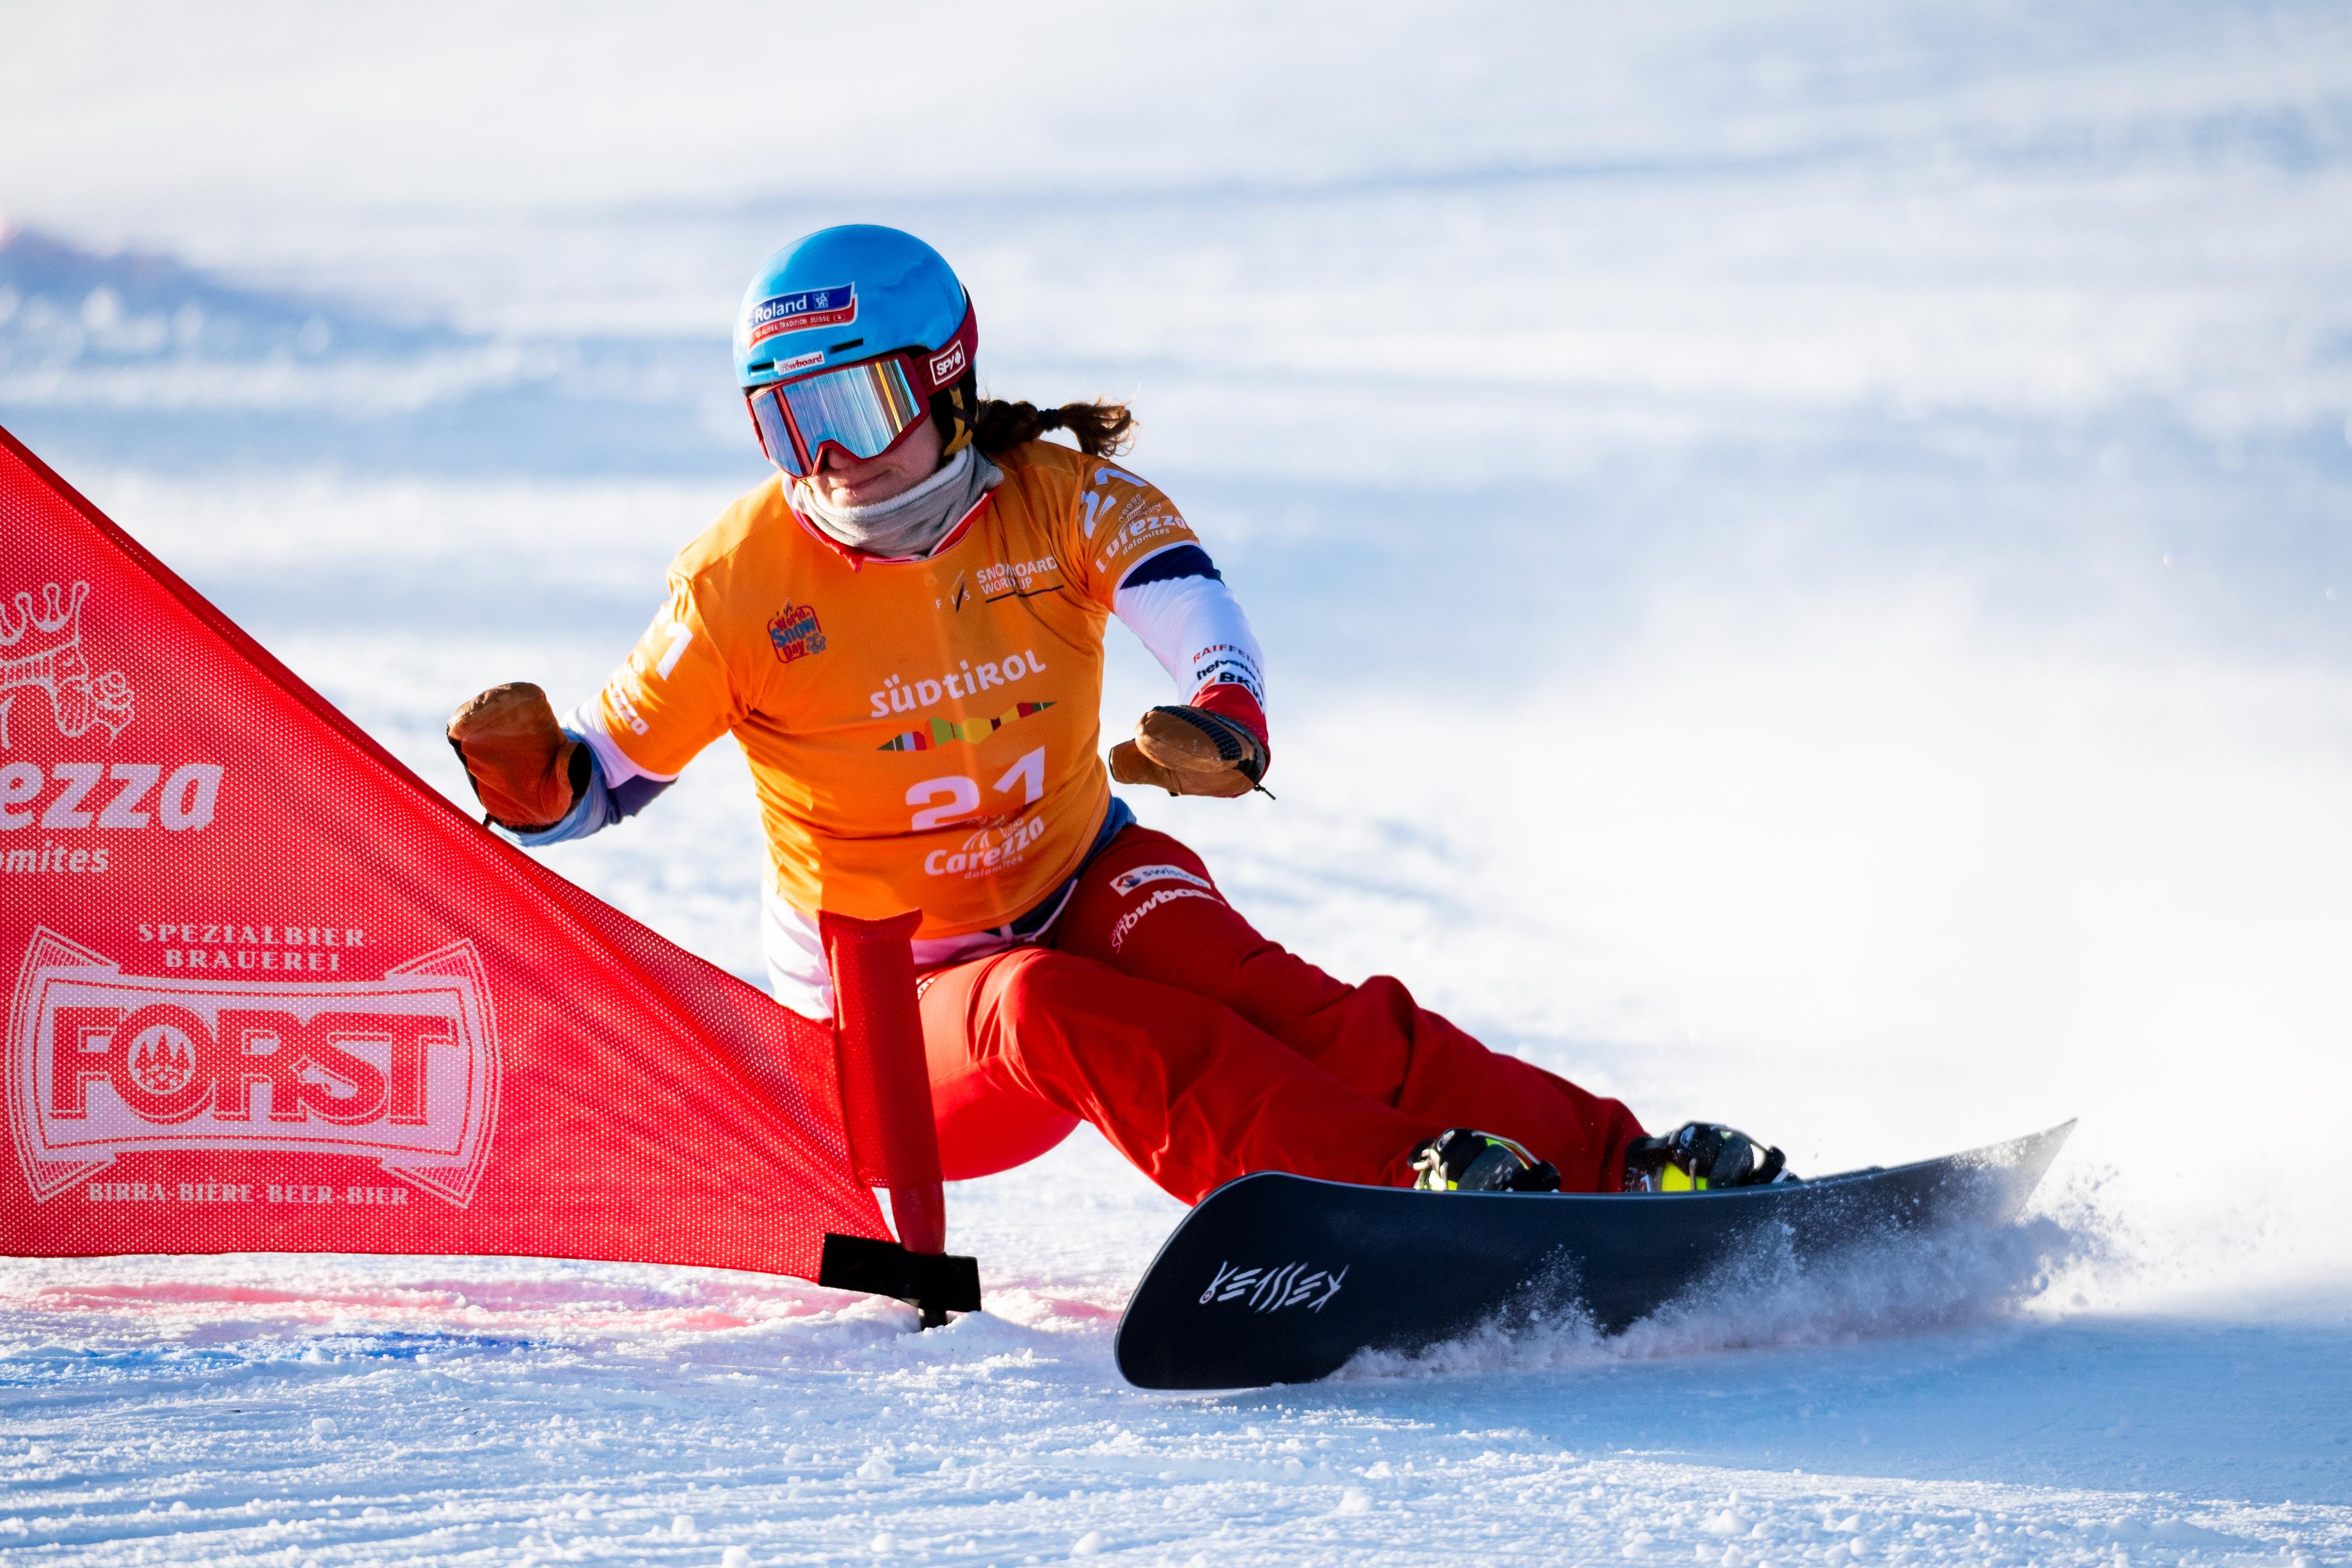 FIS Snowboard World Cup - Carezza ITA - PGS - KUMMER Patrizia SUI © Miha Matavz